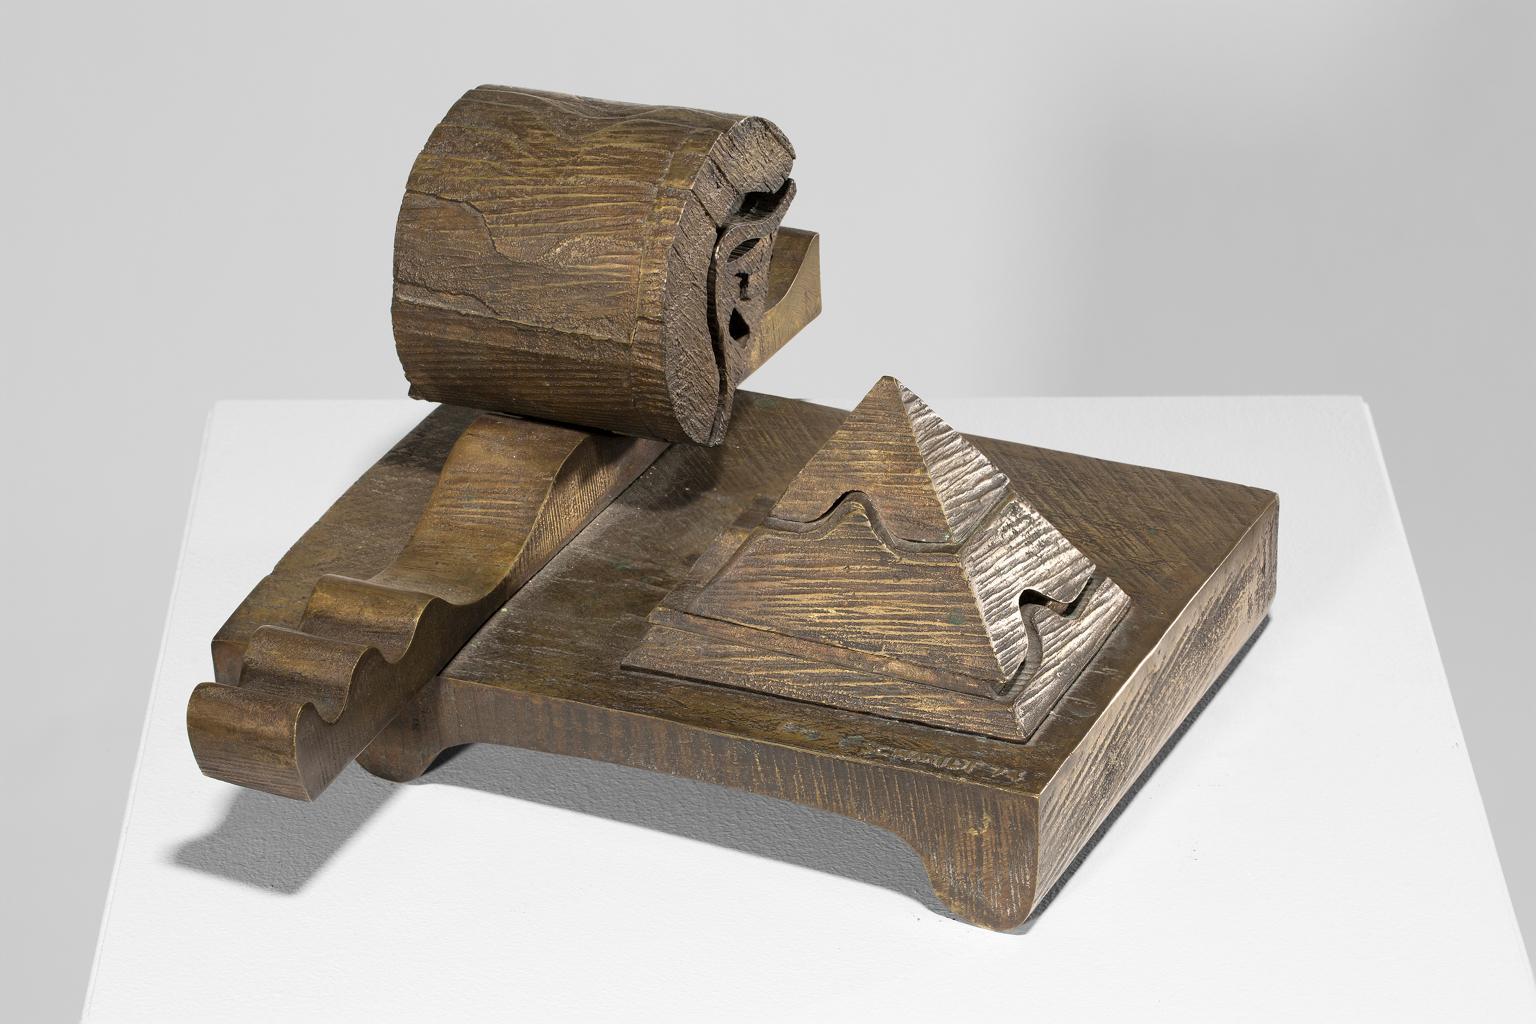 """Untitled"" Cast Iron, Bronze, Futuristic, Geometric, Sepia Tones"